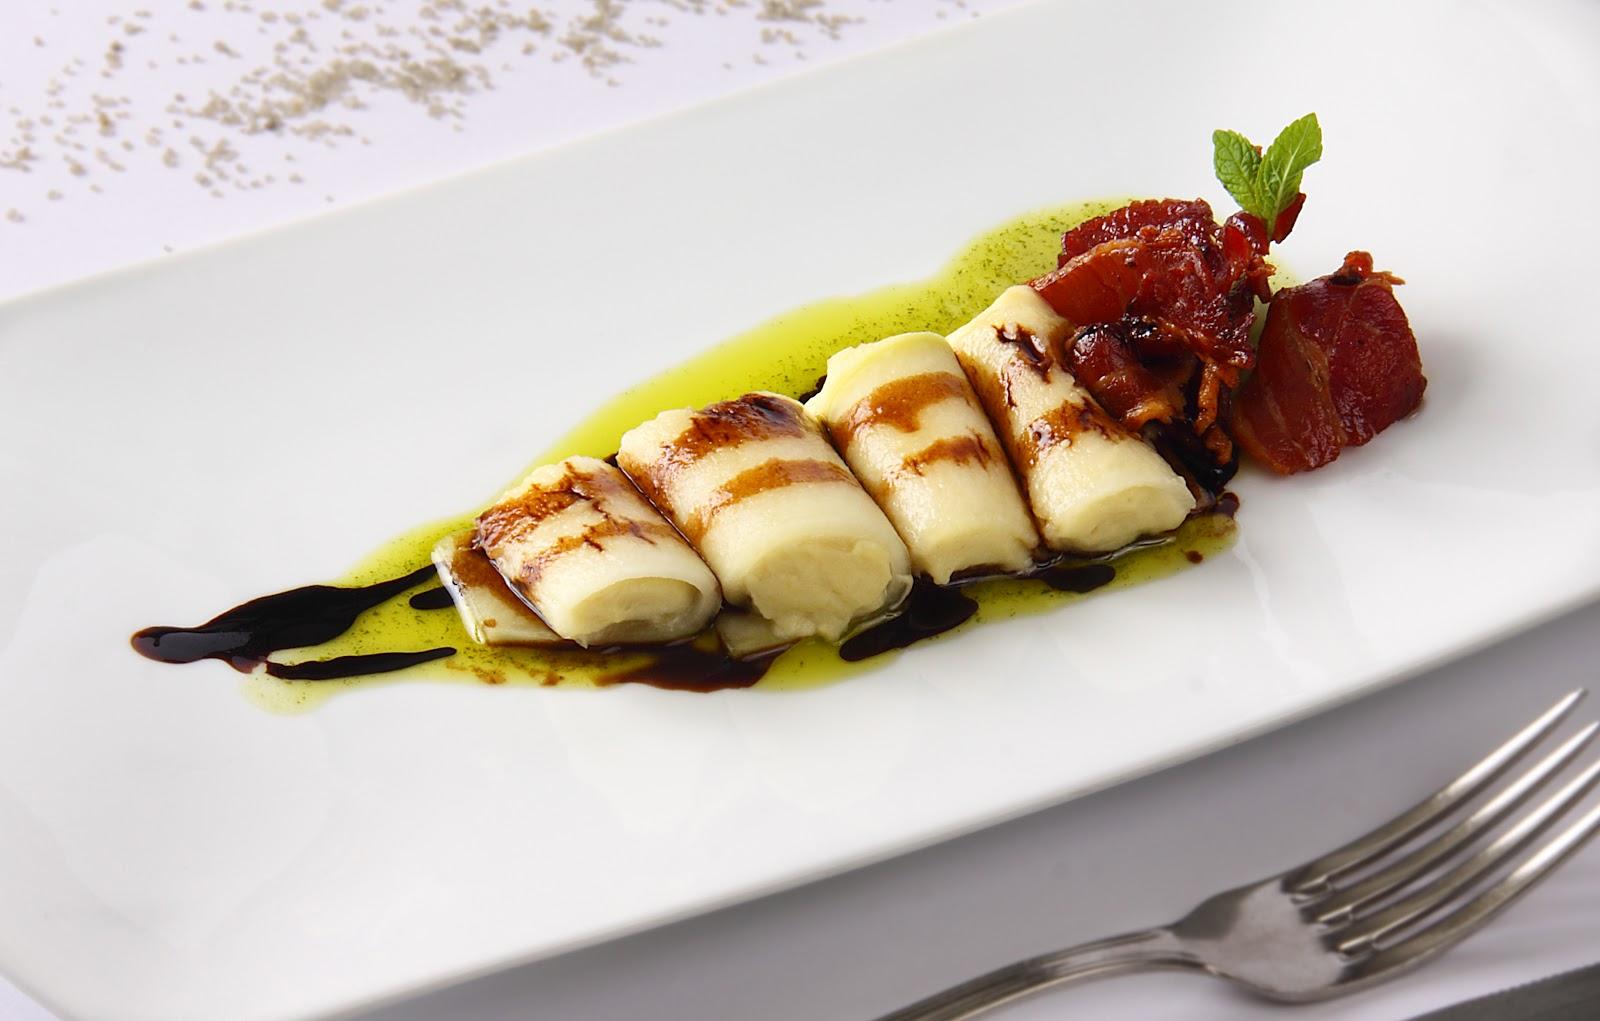 Comapormenos restaurante gourmet nuestros platos for Platos gourmet